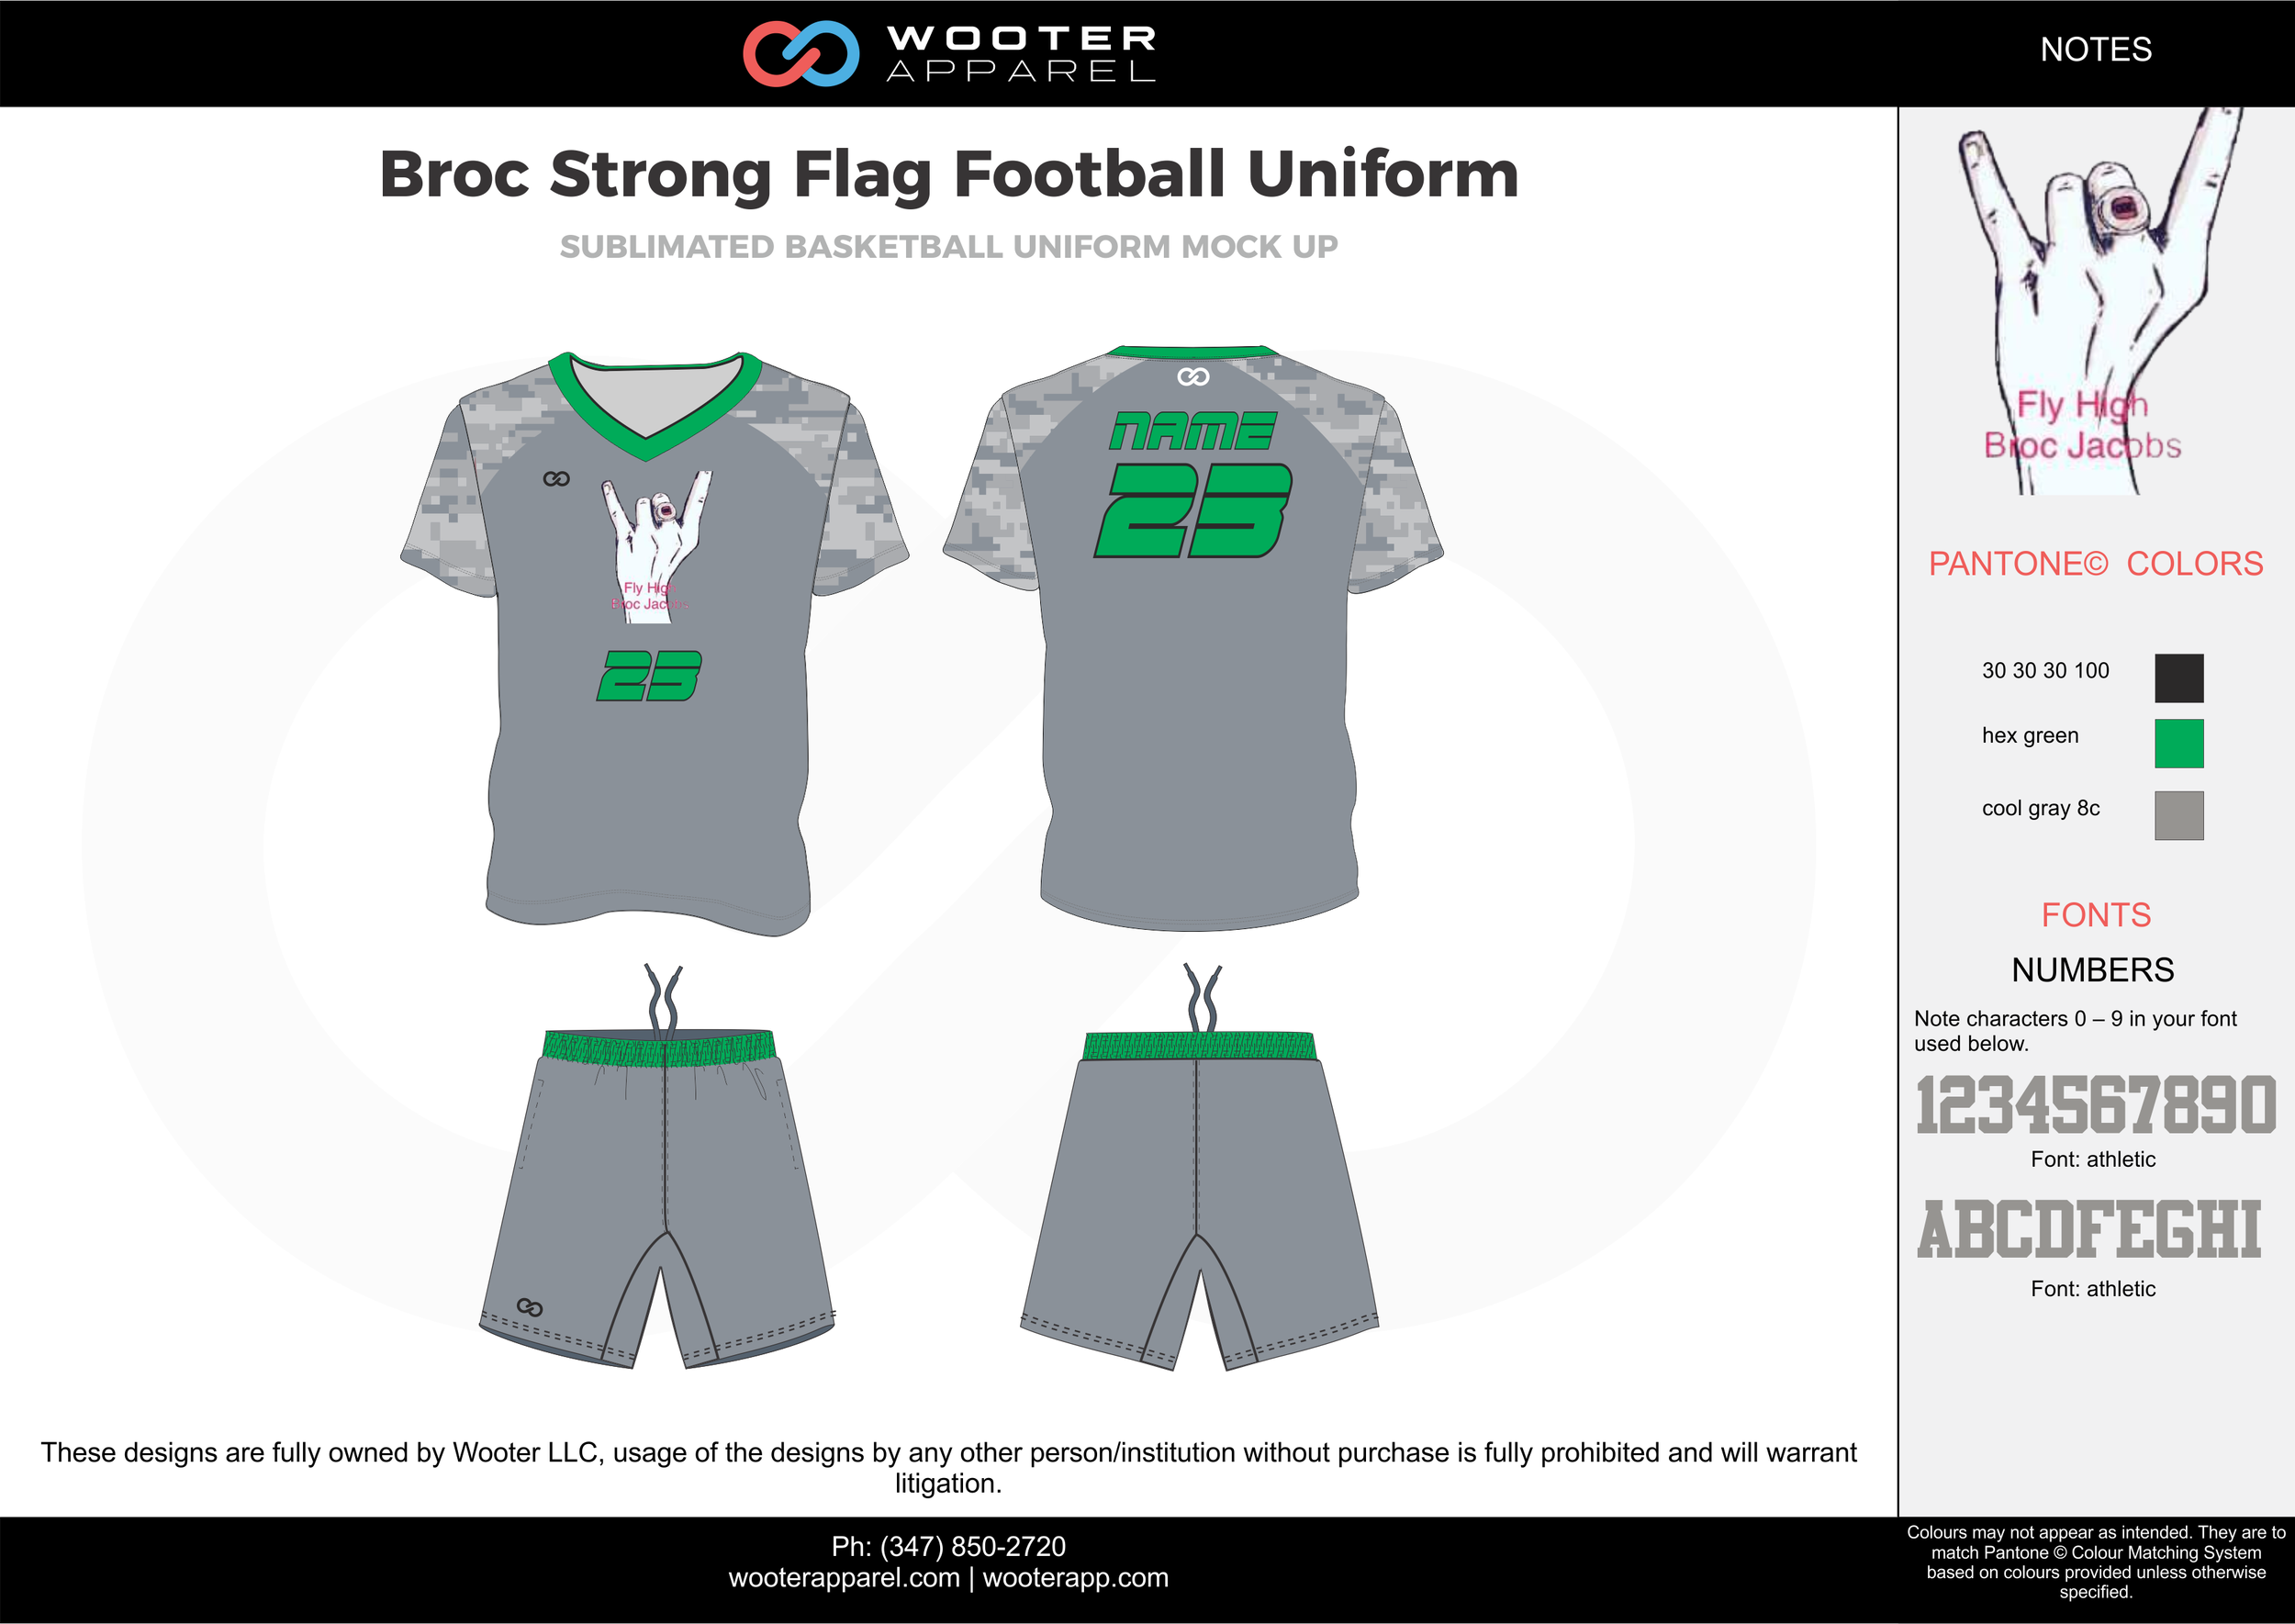 Broc Strong Flag gray green black football uniforms jerseys shorts